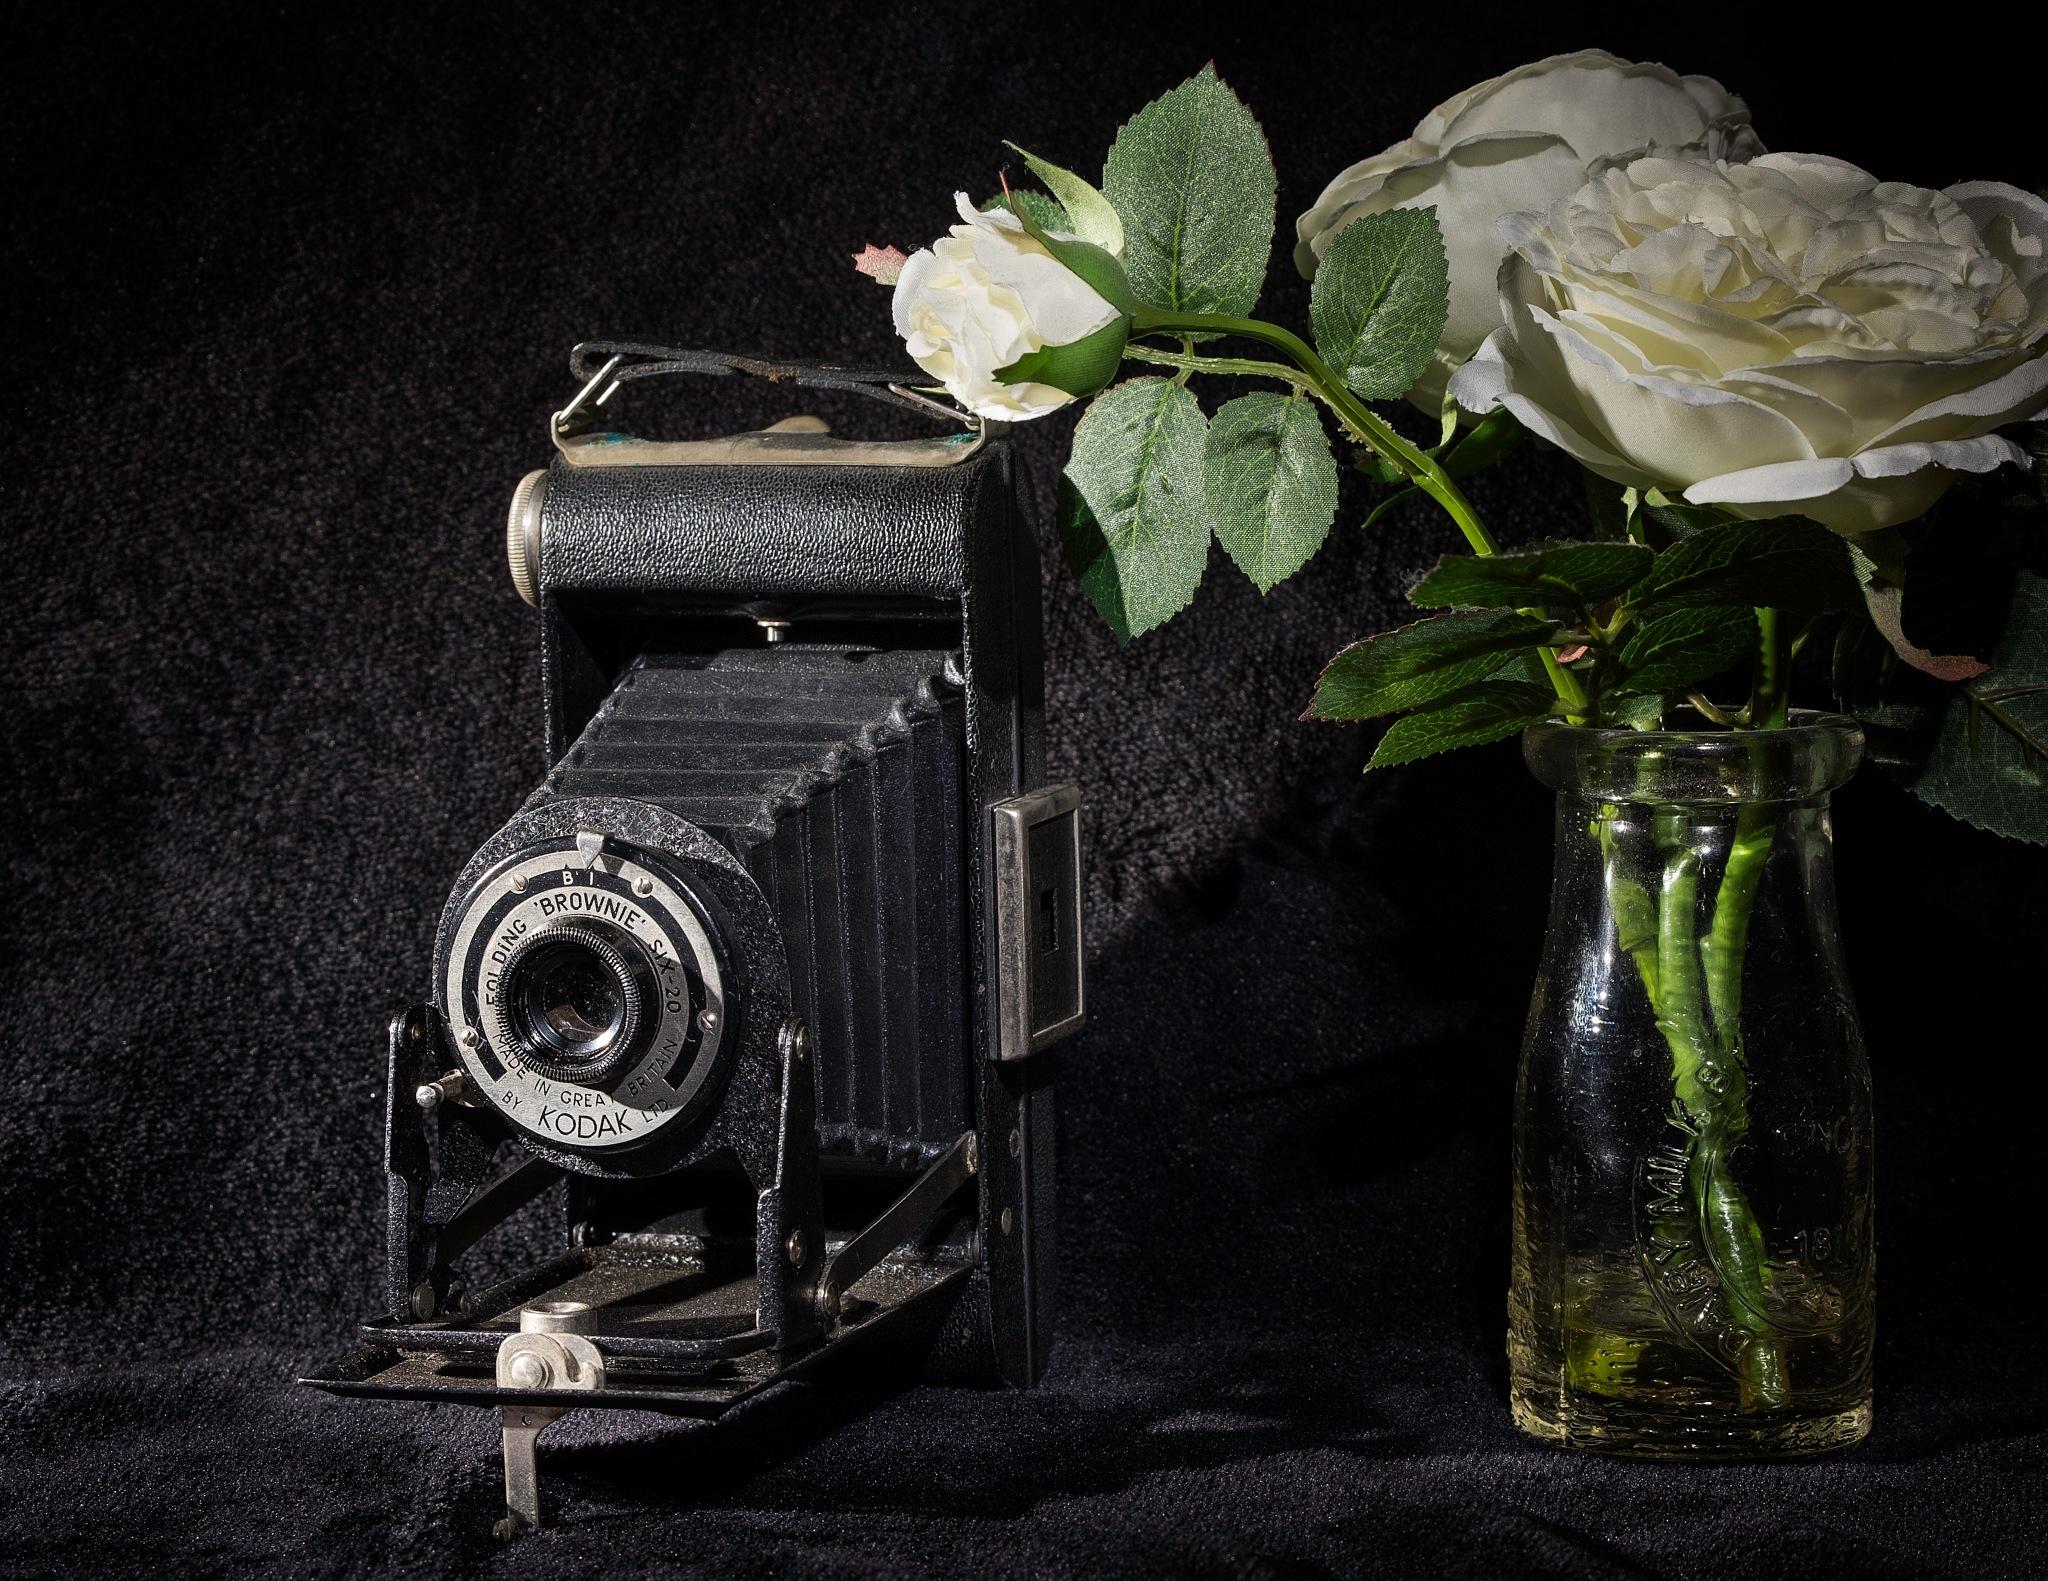 Kodak Folding Brownie Camara by Barry